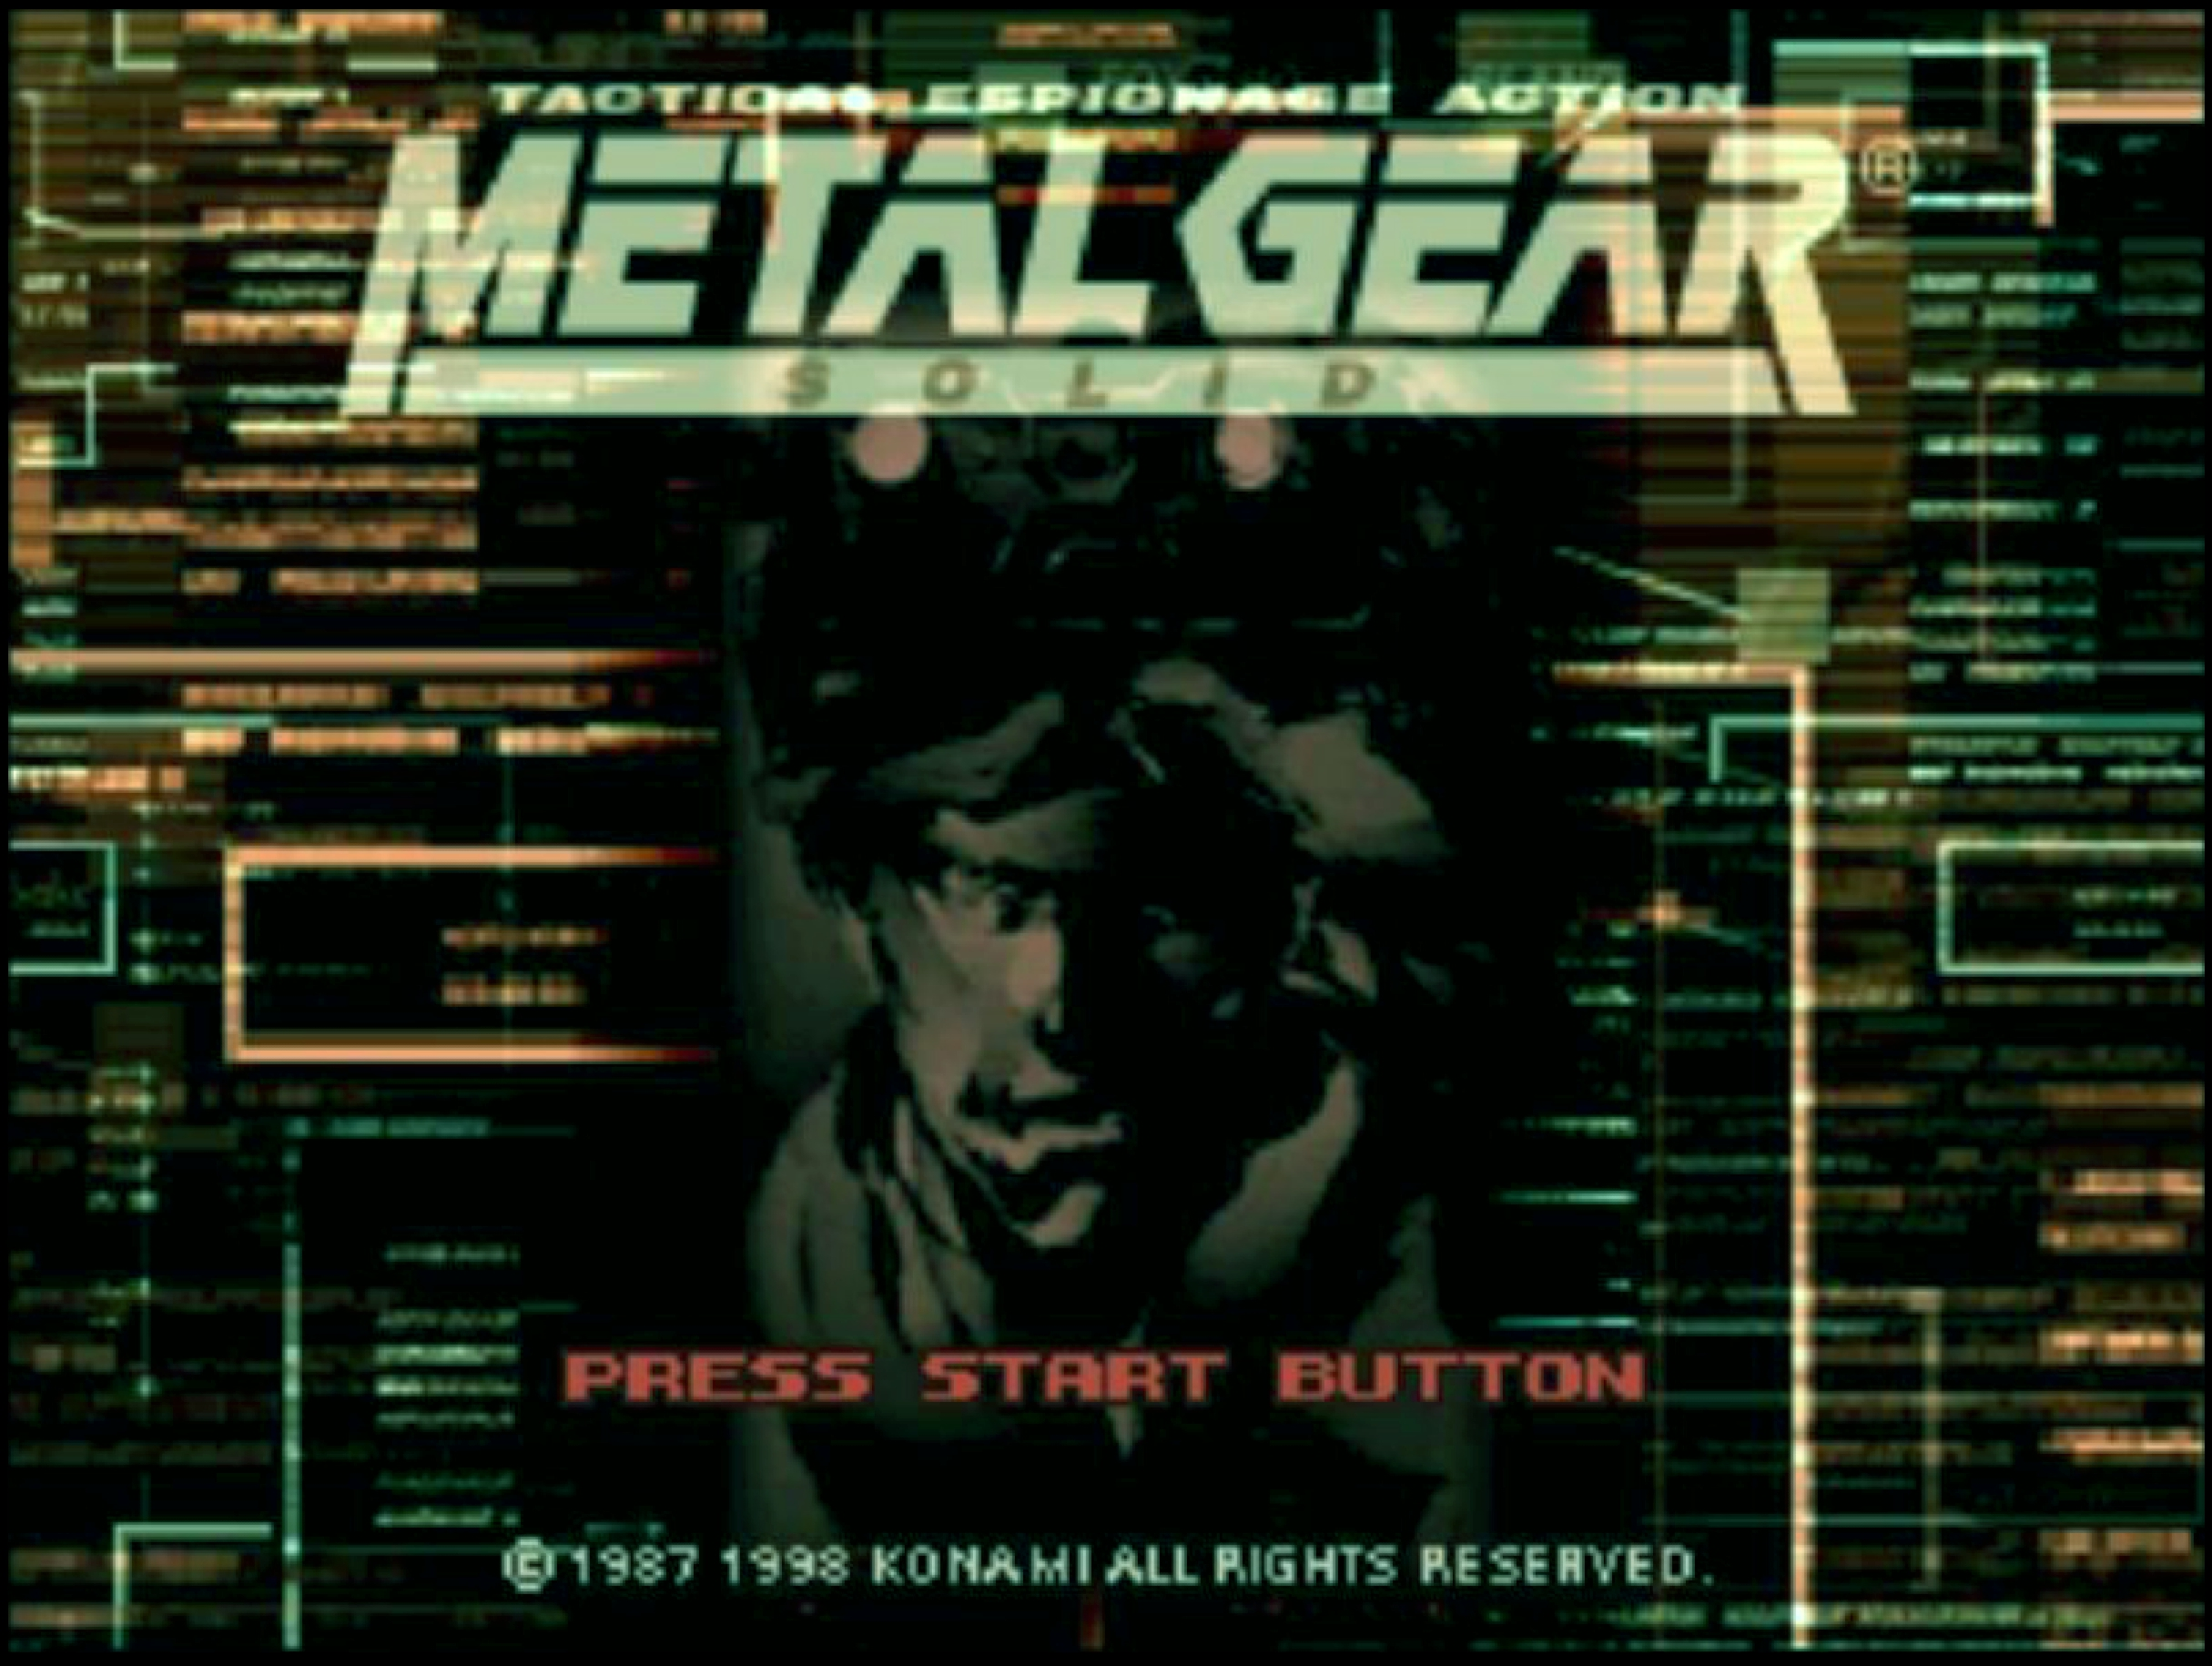 Metal Gear Solid By Nailz Dx On Deviantart